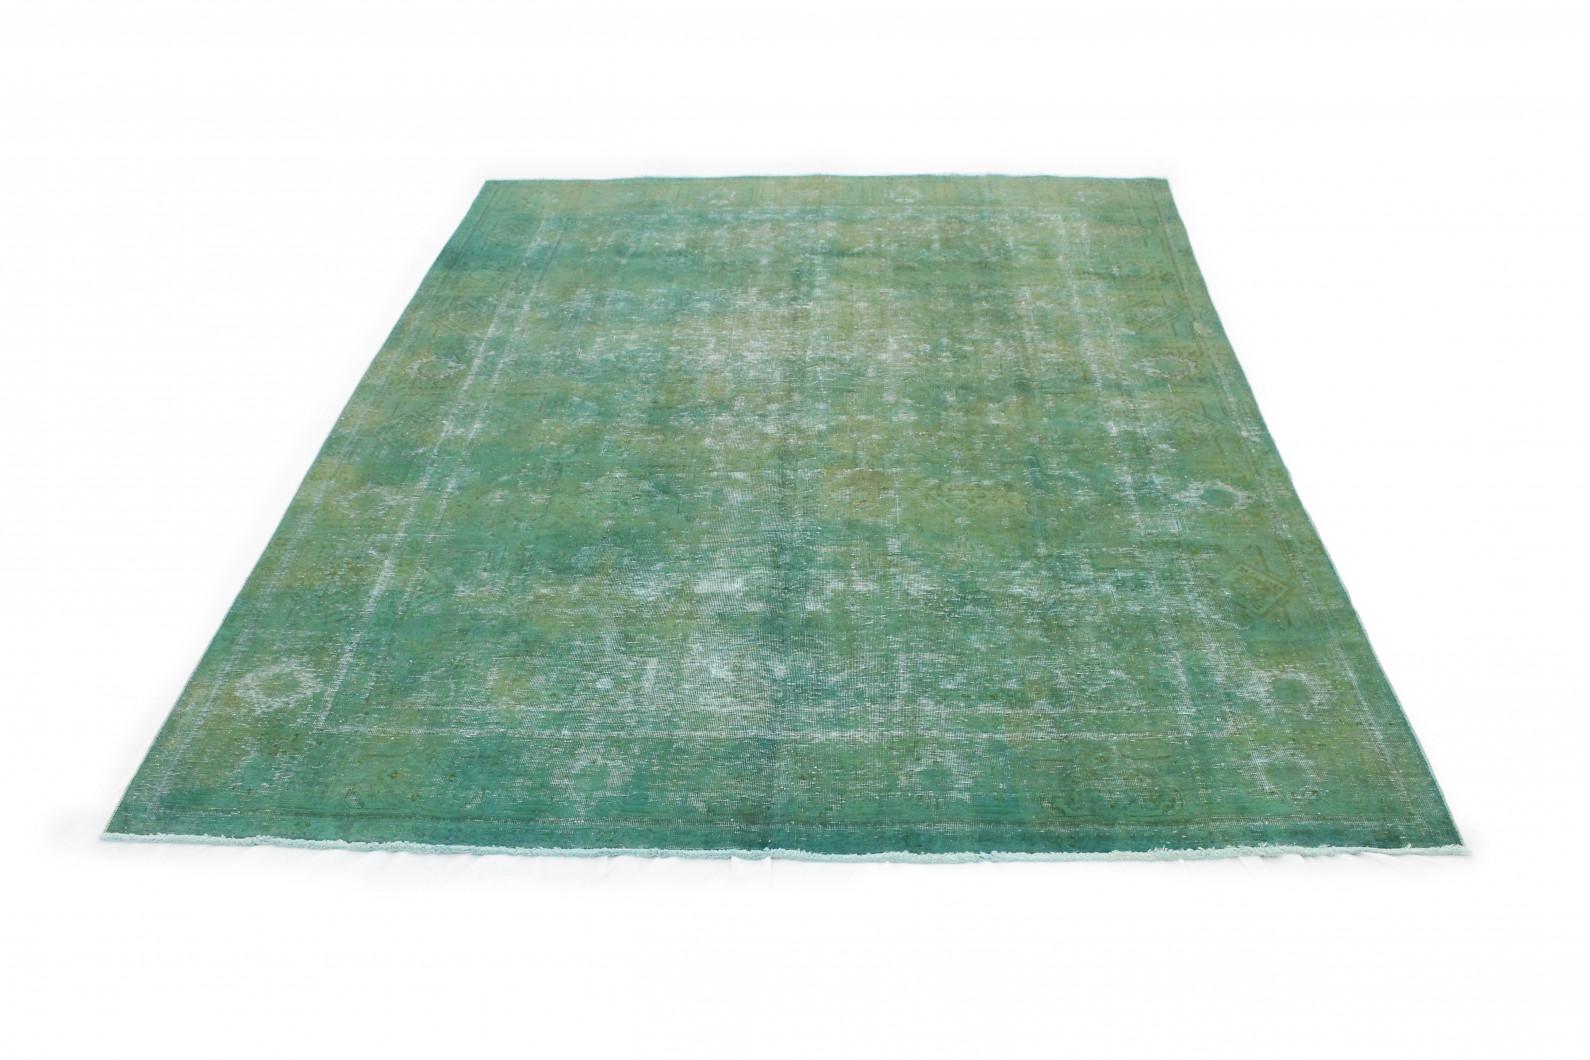 vintage teppich gr n in 380x290cm 1001 3261 bei kaufen. Black Bedroom Furniture Sets. Home Design Ideas